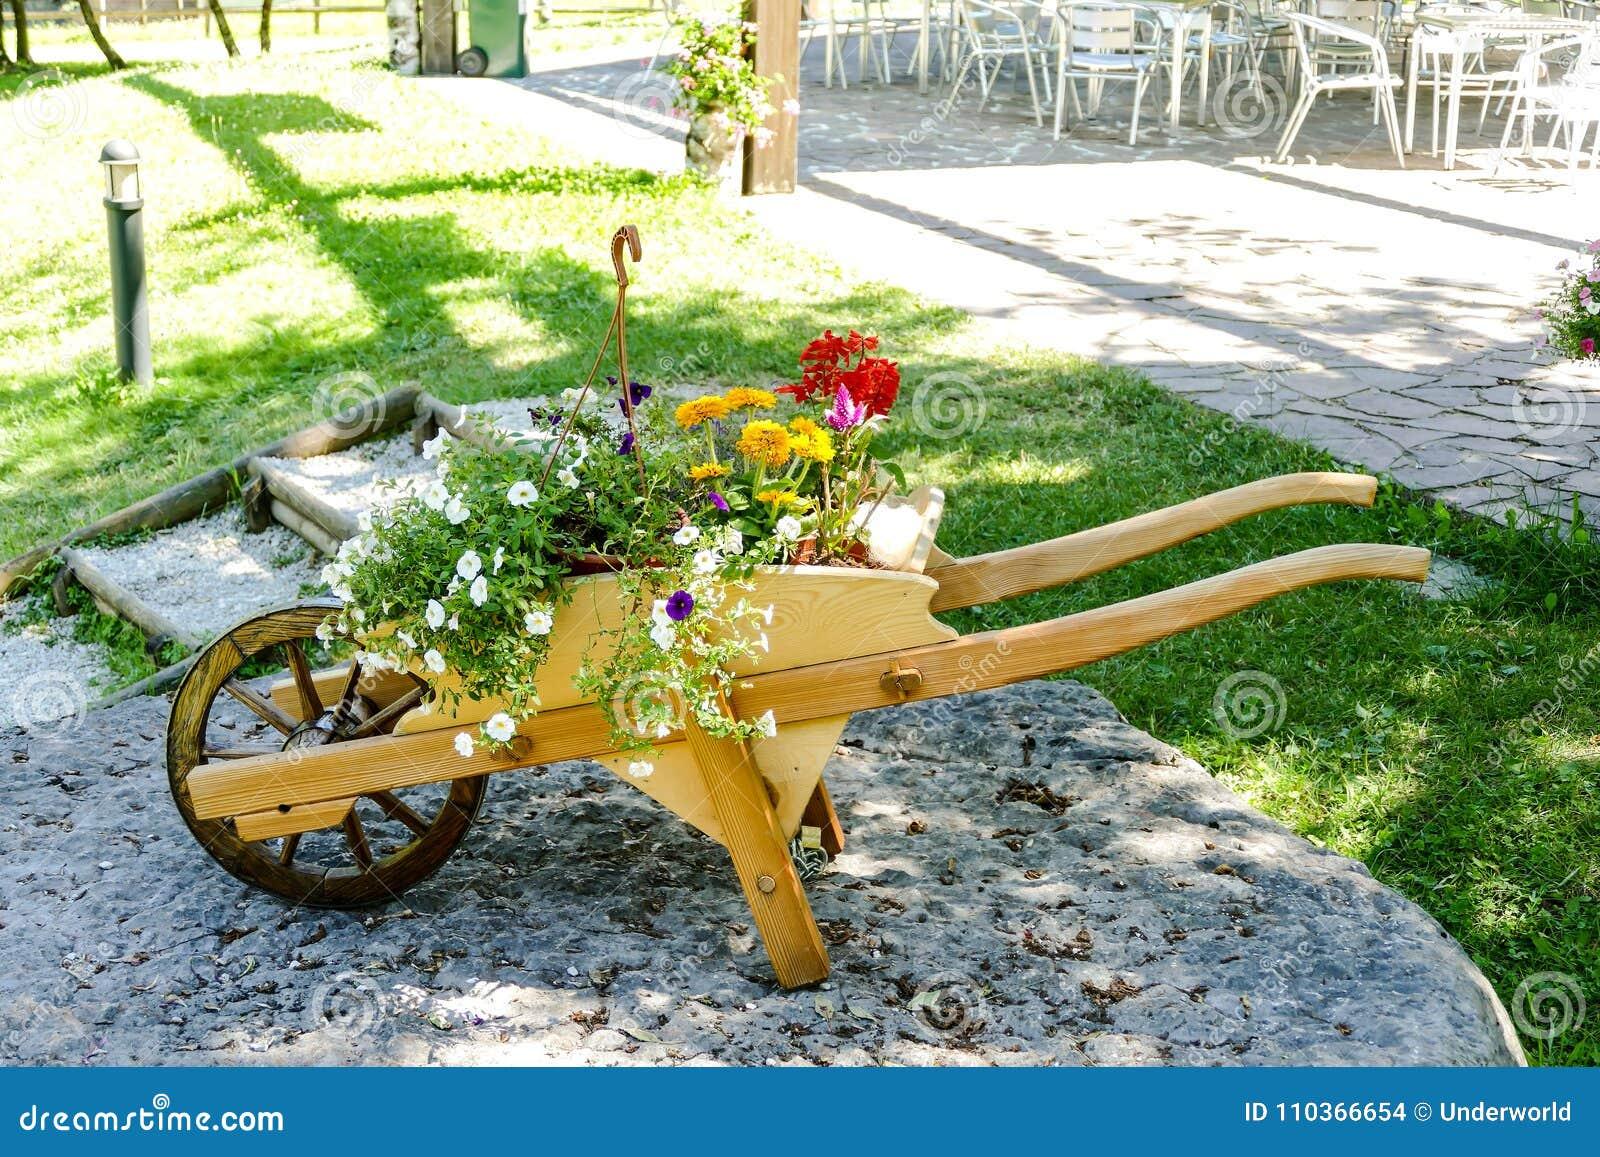 Decorative Wooden Wheelbarrow With Flowers Stock Photo - Image of ...